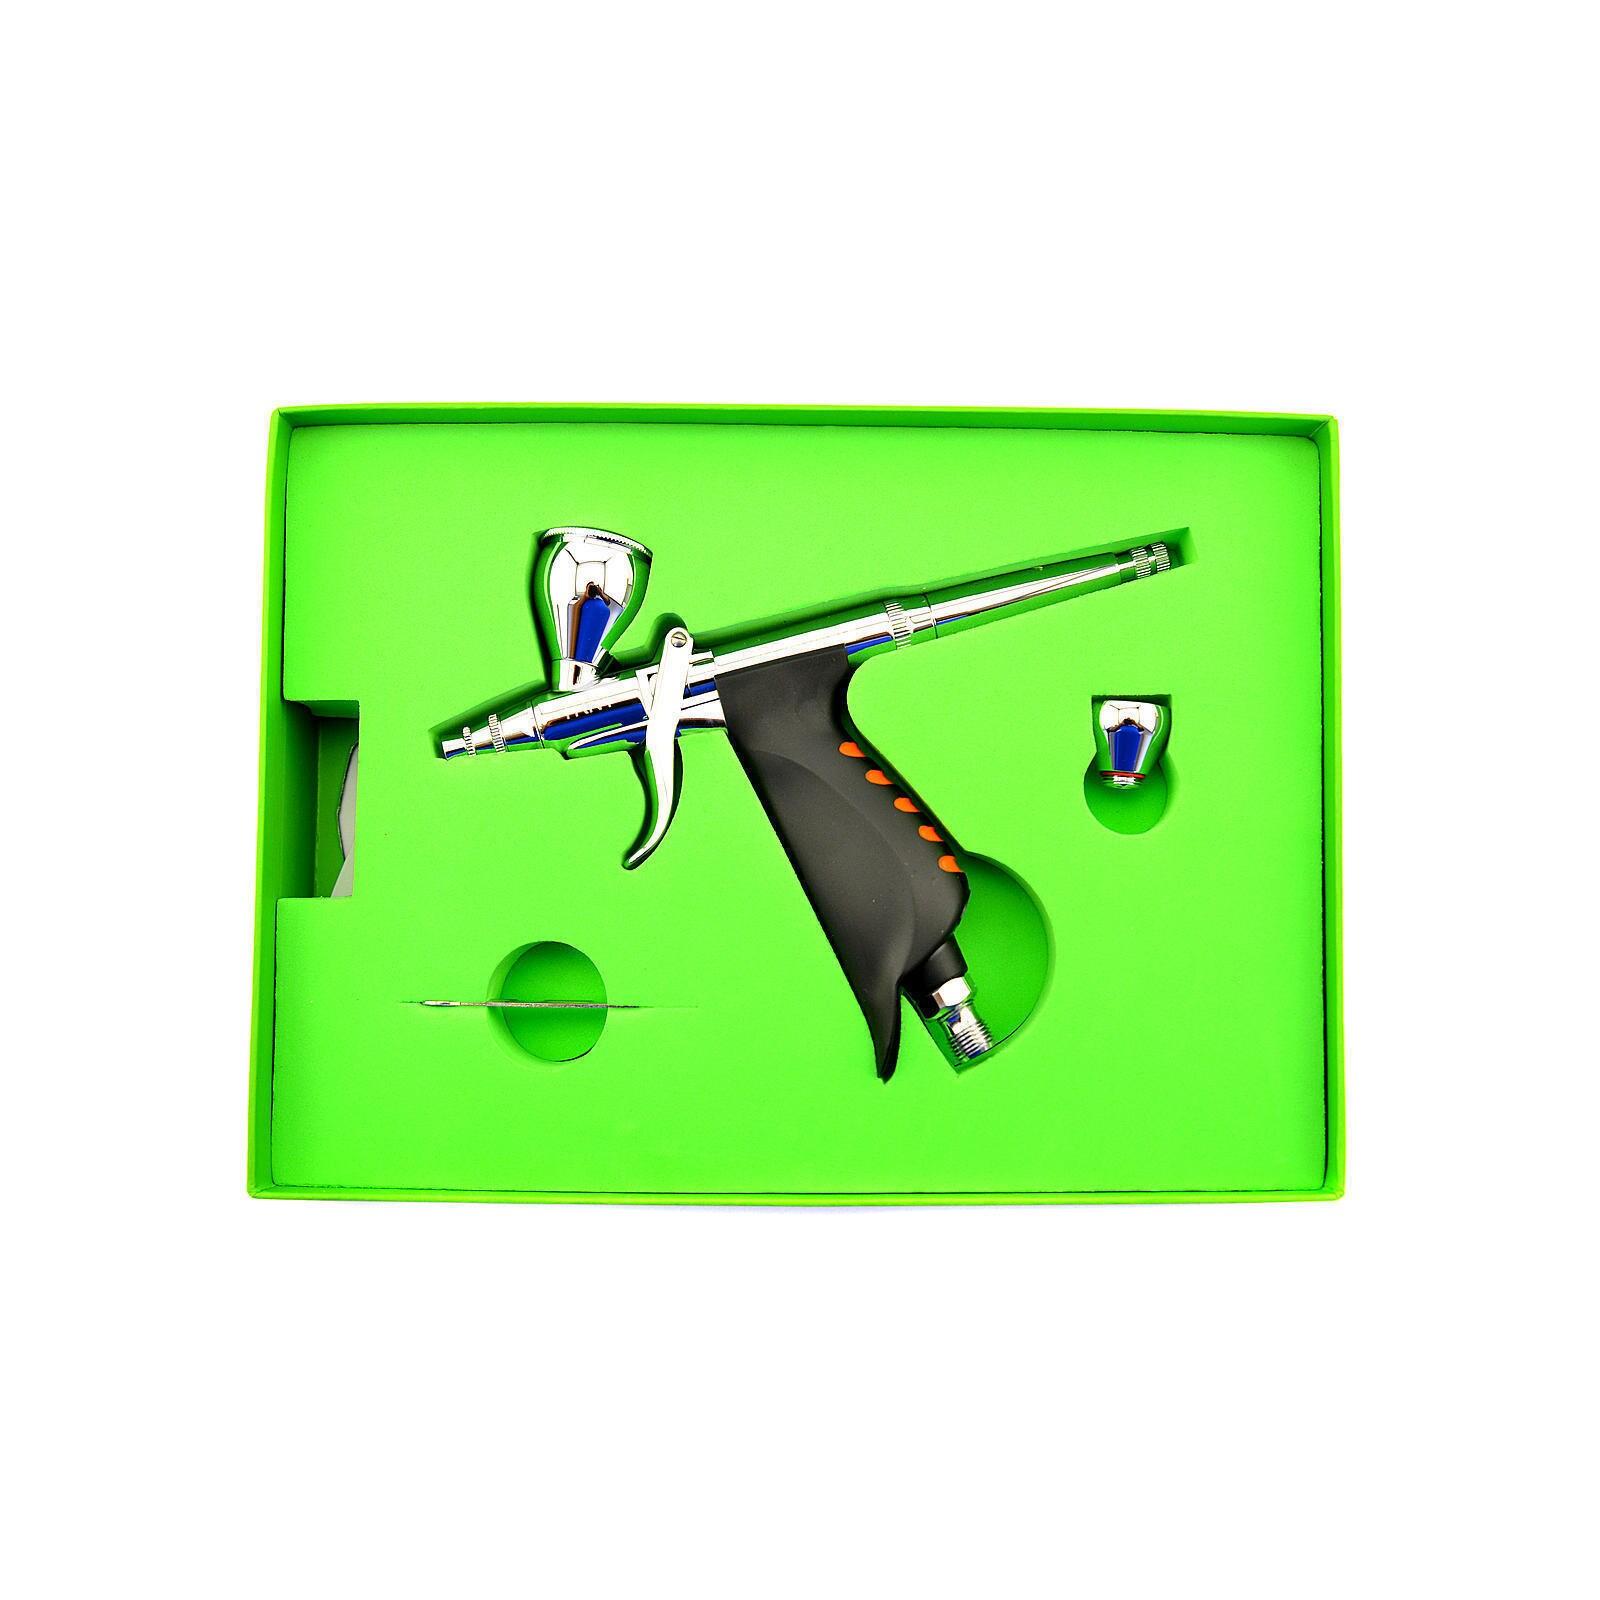 IWATA Neo TRN2 Side-Feed Trigger Airbrush (each)